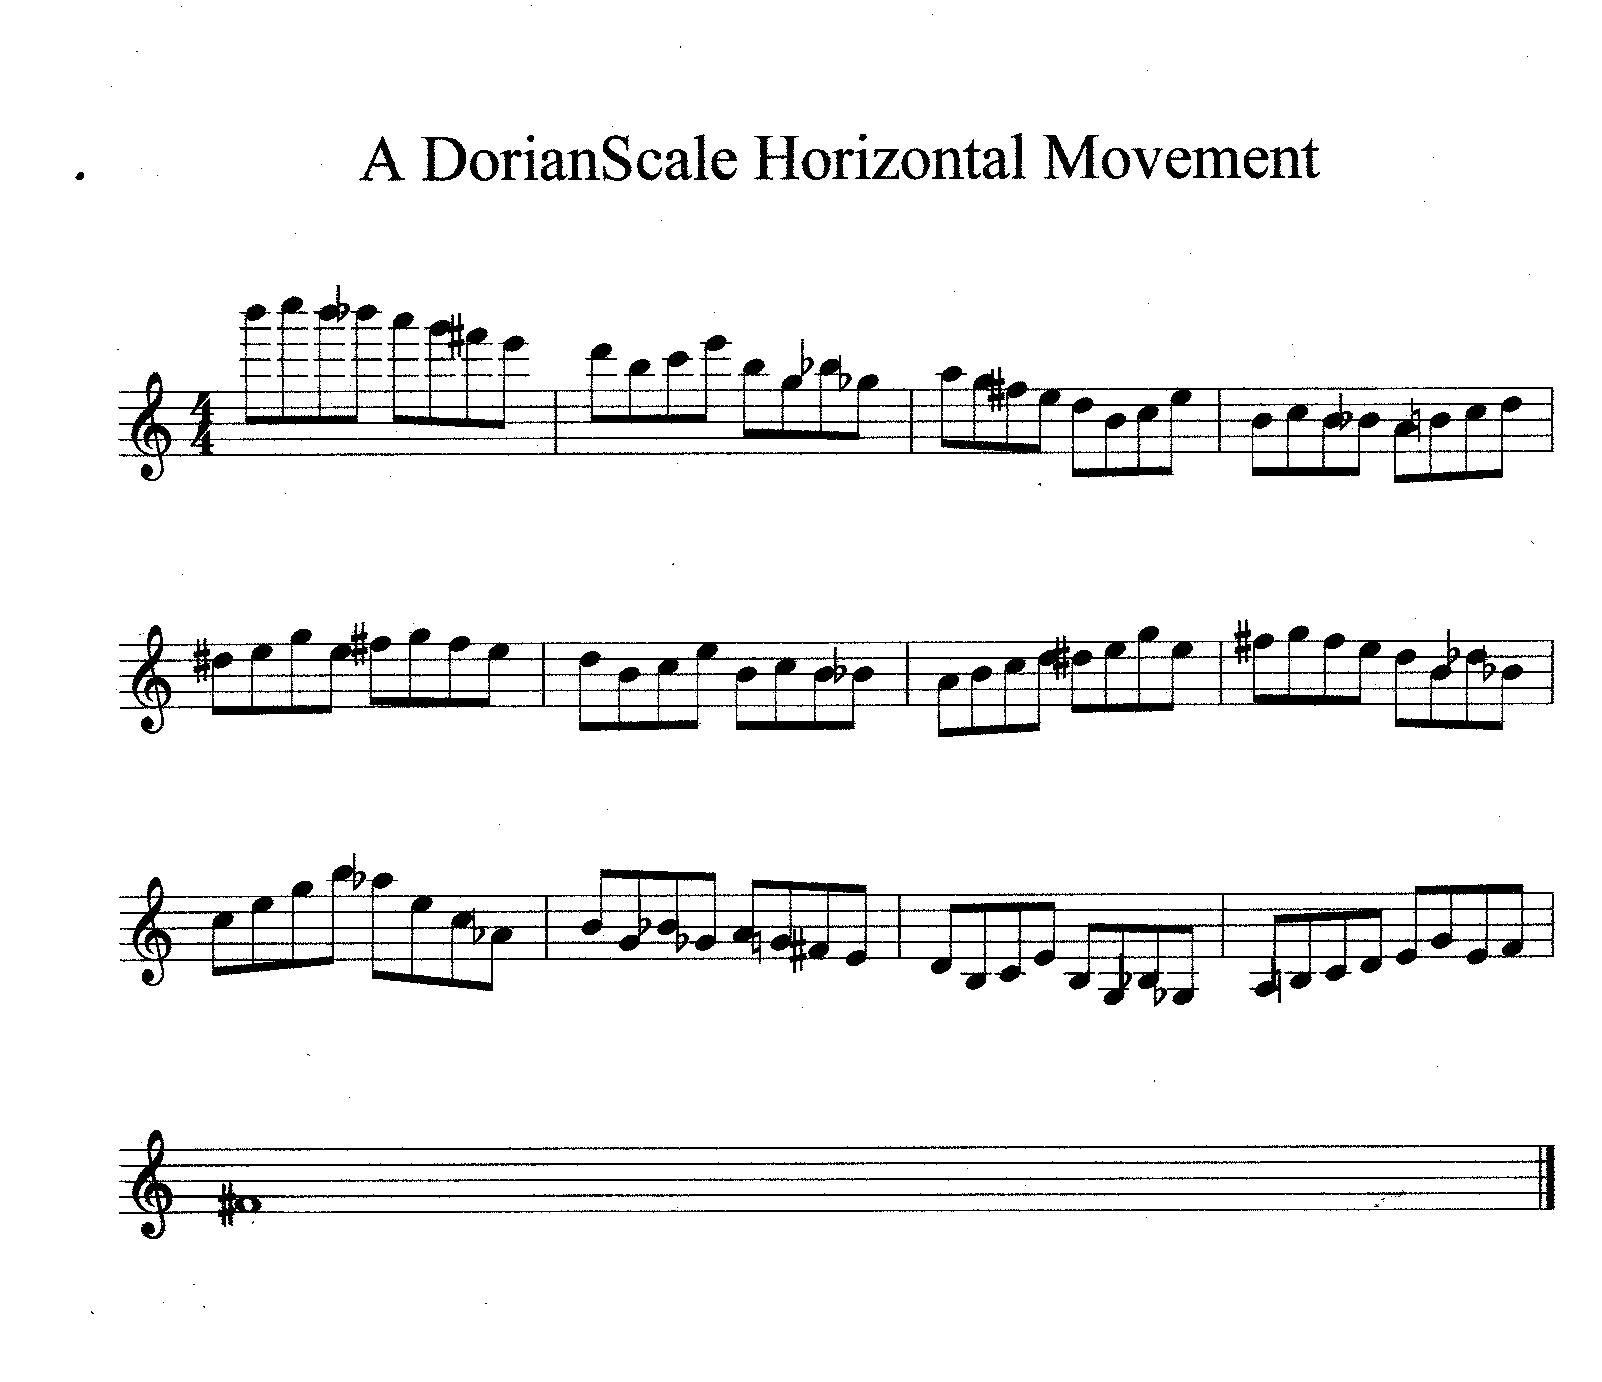 A DorianScale Horizontal Movement